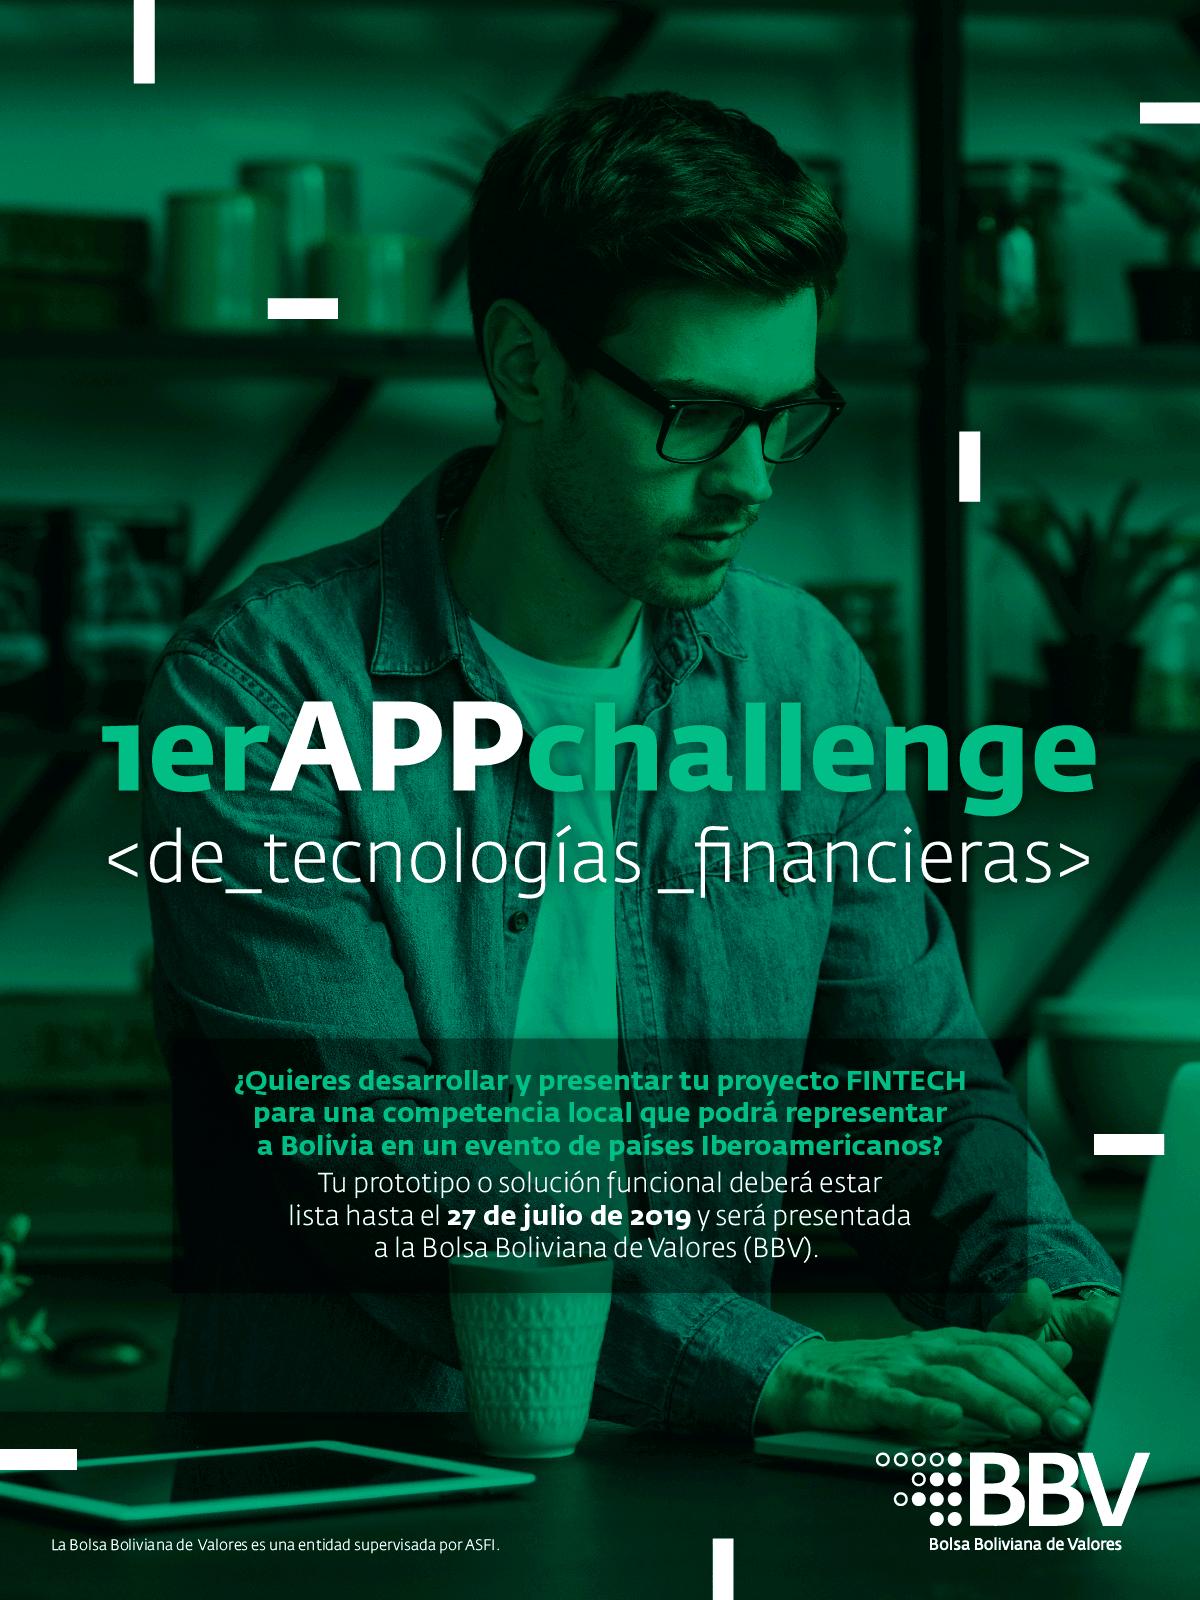 1er App Challenge de FINTECH de la Bolsa Boliviana de Valores